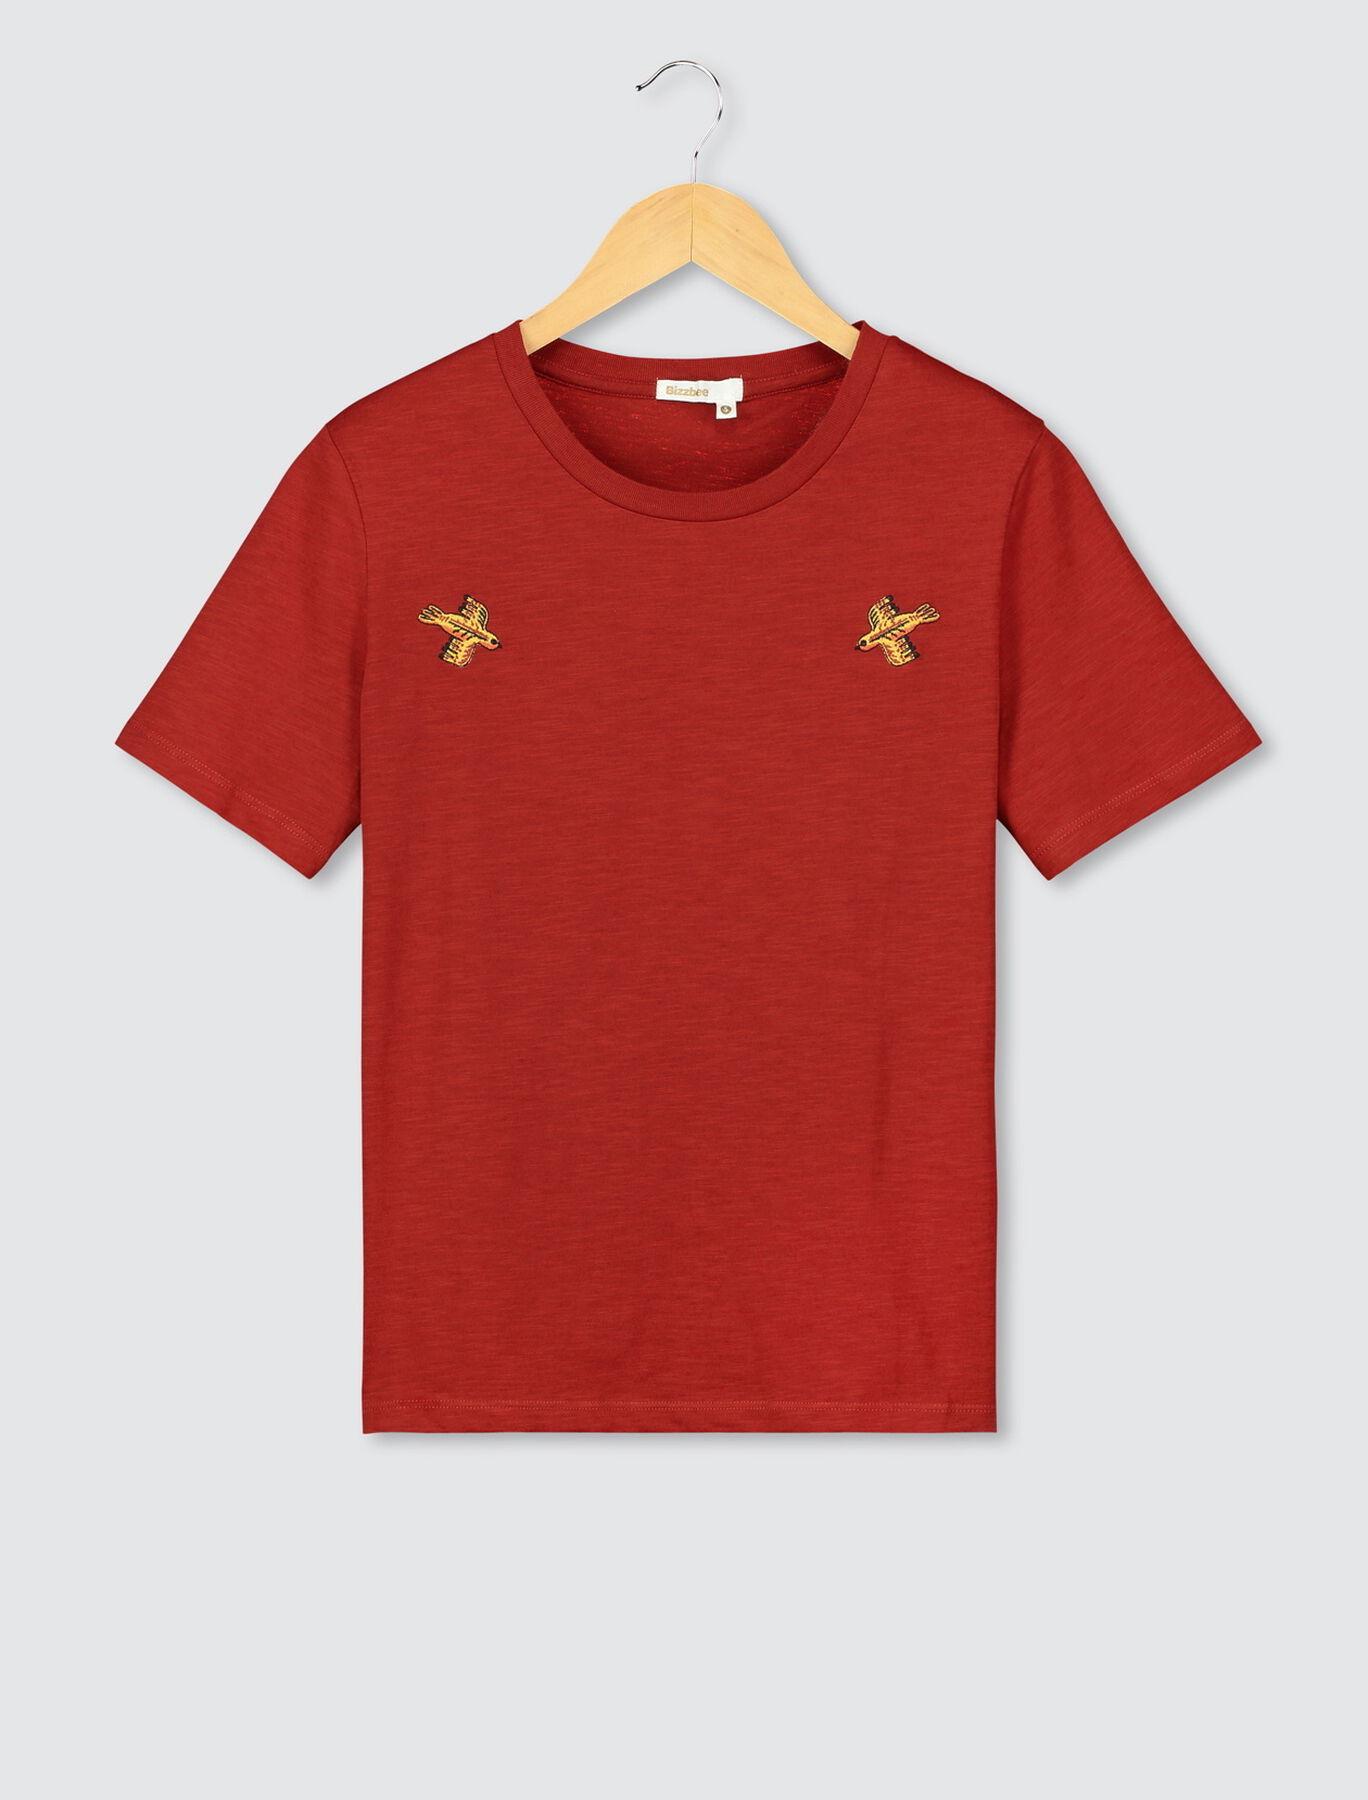 T-shirt broderie poitrine coton bio